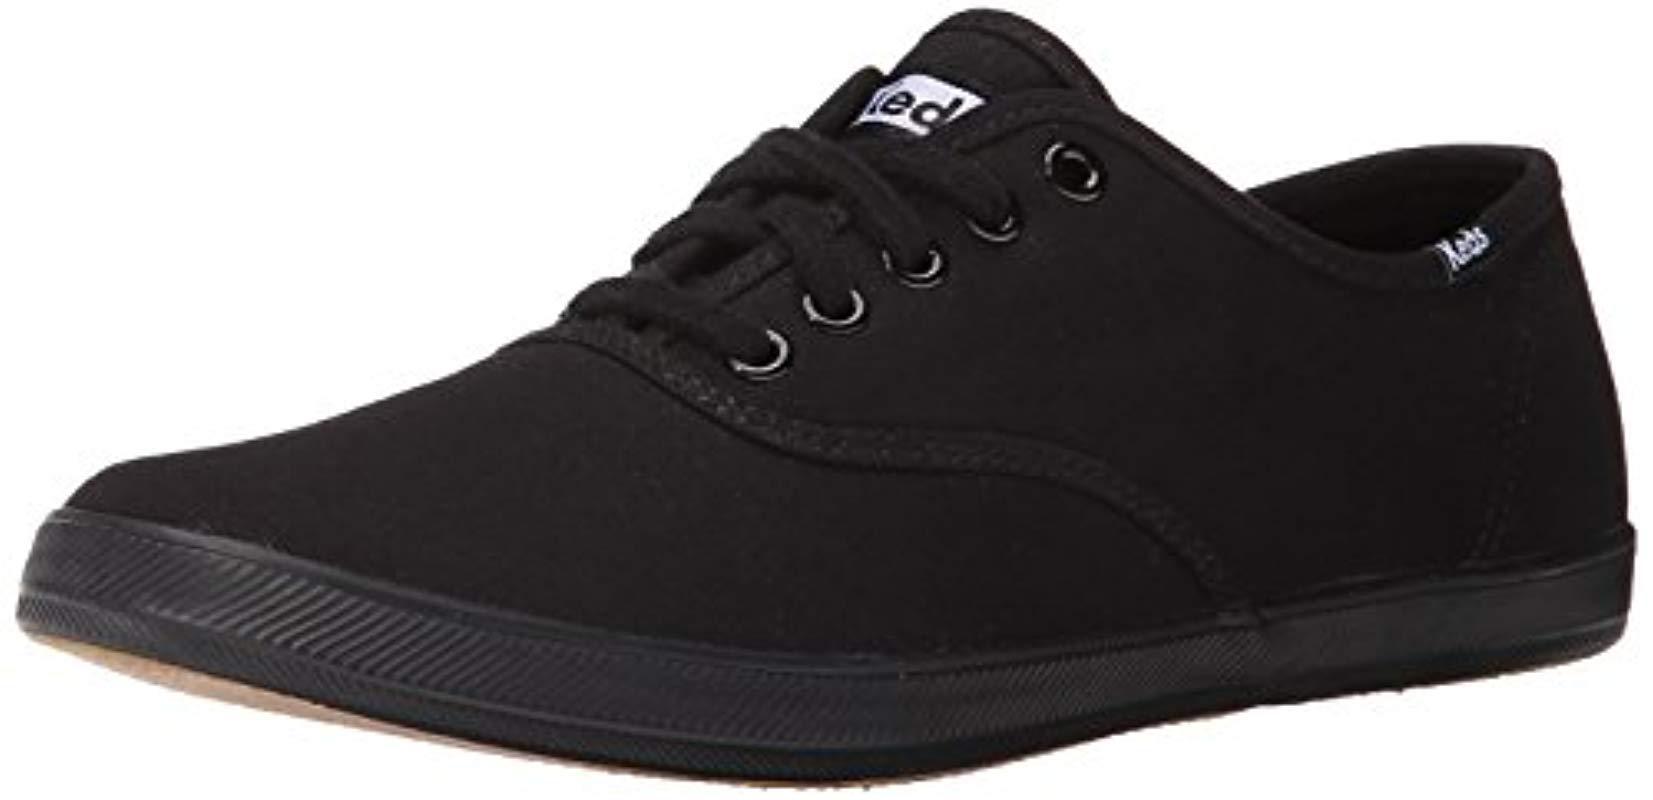 6ecc94efe24 Lyst - Keds Champion Original Canvas Sneaker in Black for Men